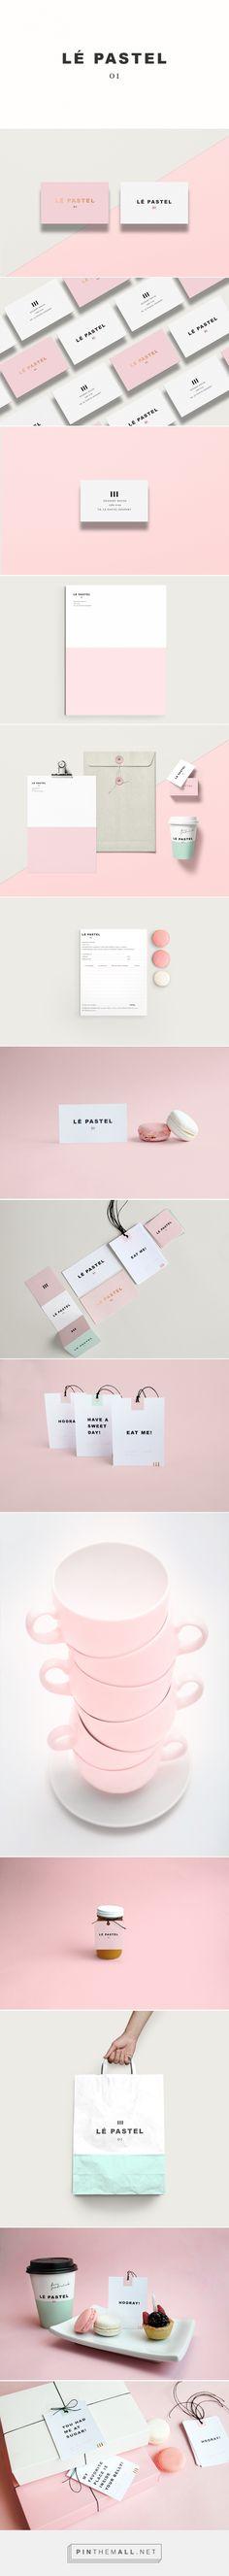 Lé Pastel branding